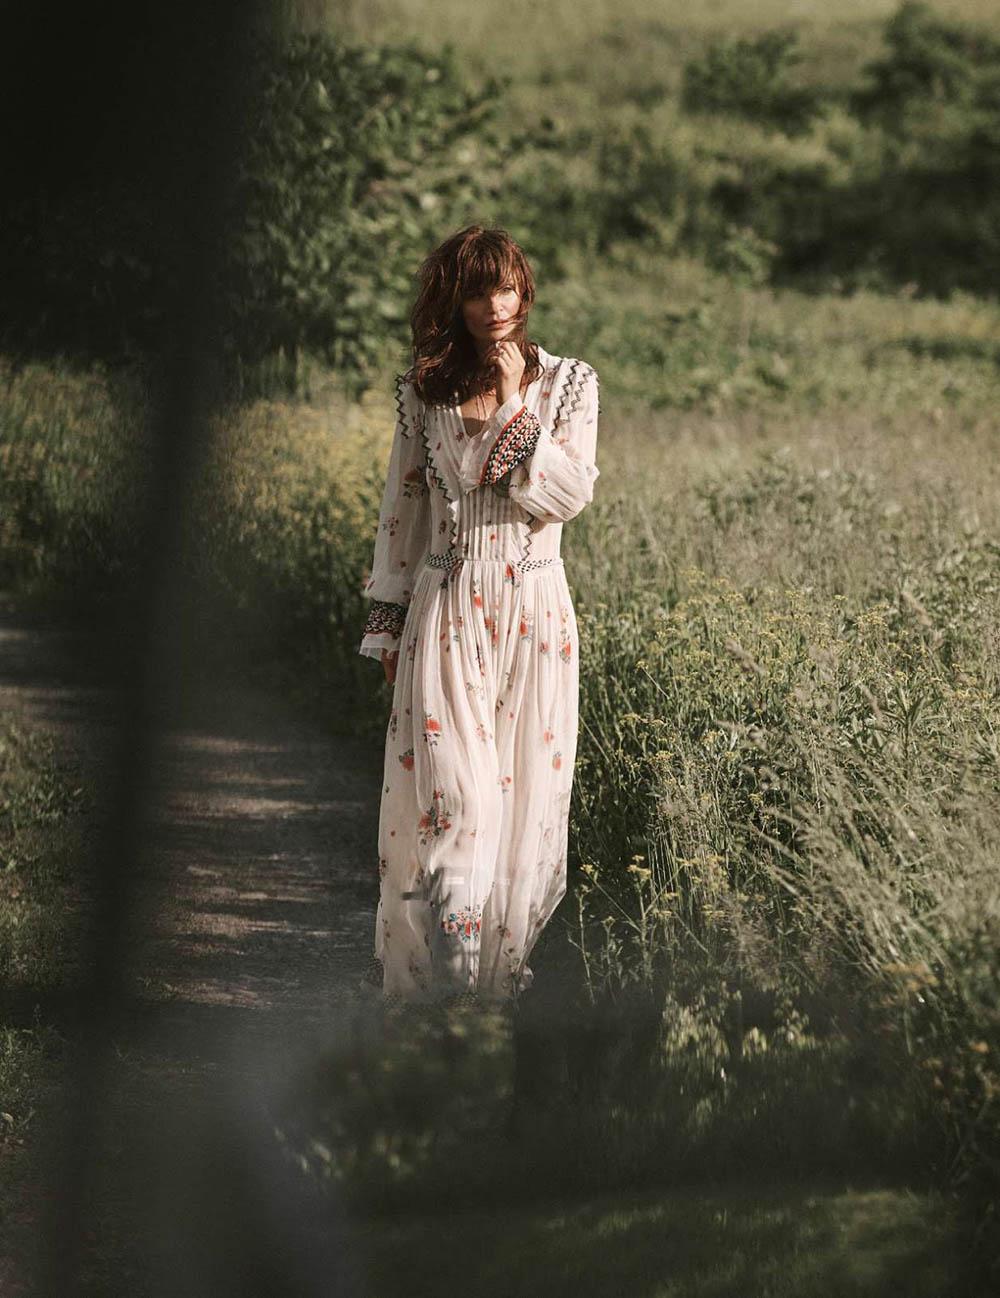 Helena Christensen covers Elle France July 27th, 2018 by Blair Getz Mezibov